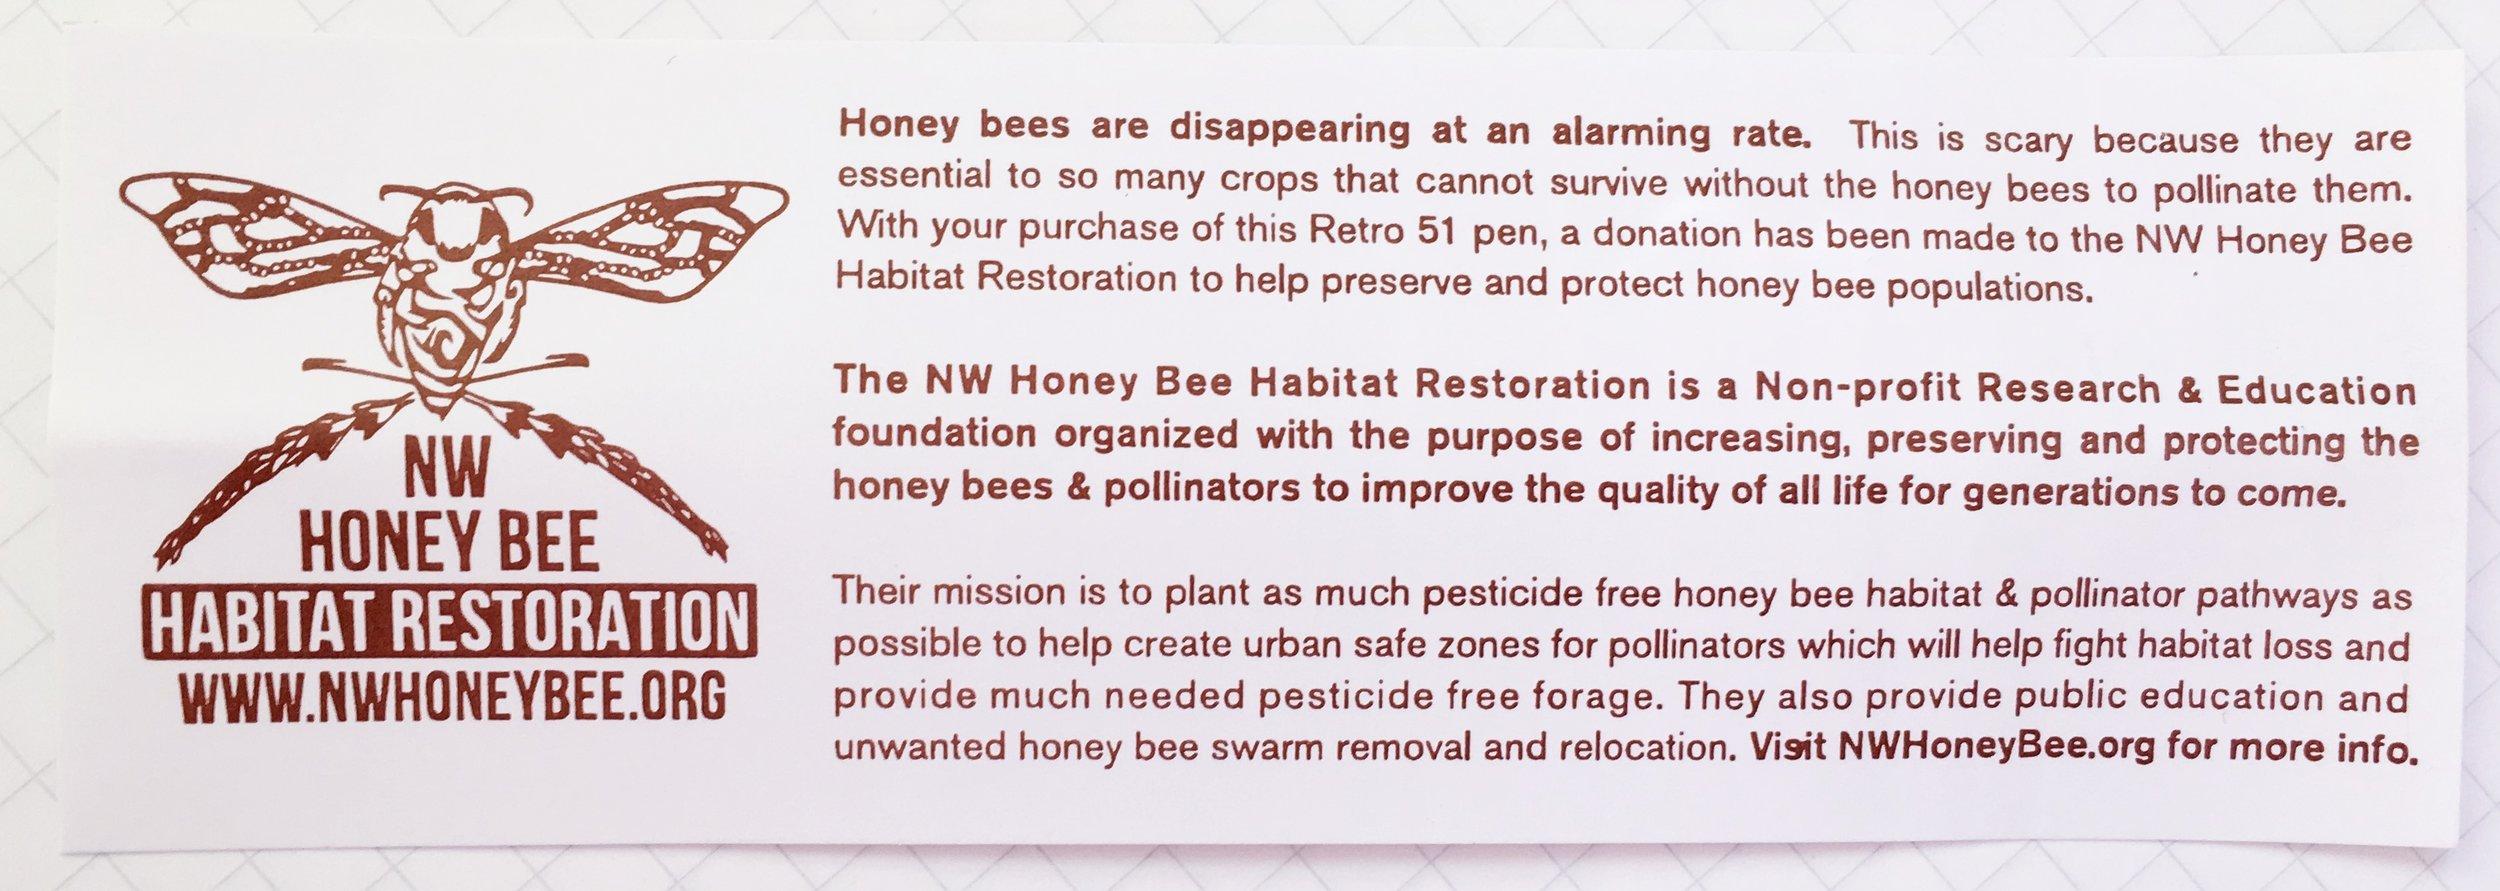 Retro 51 Rescue Tornado Buzz Honey Bee Habitat